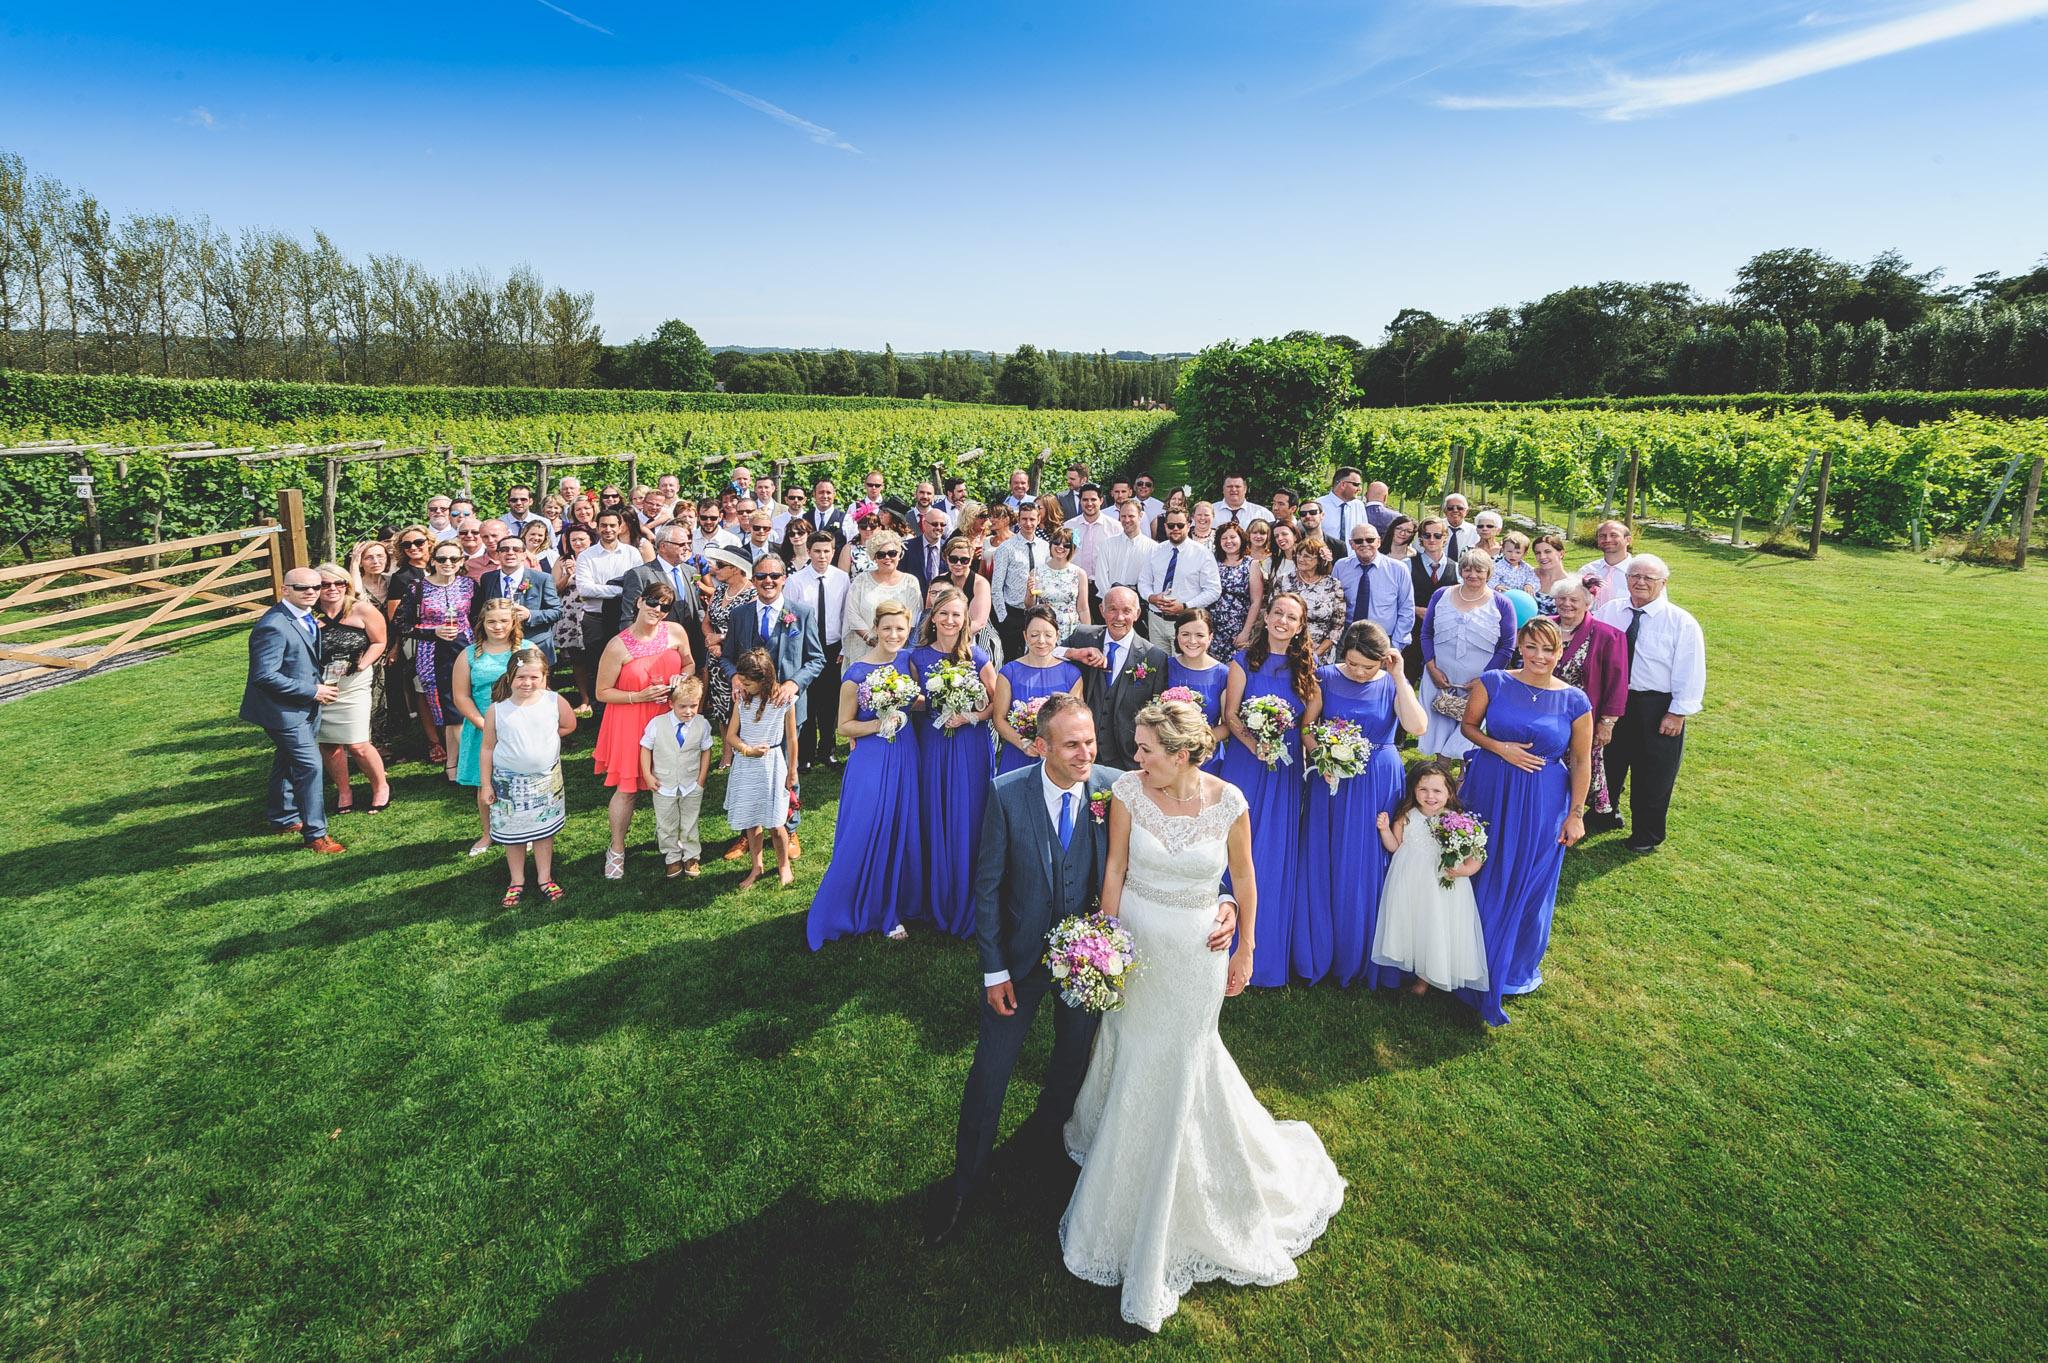 Llanerch Vineyard Wedding Photography August 2014 1